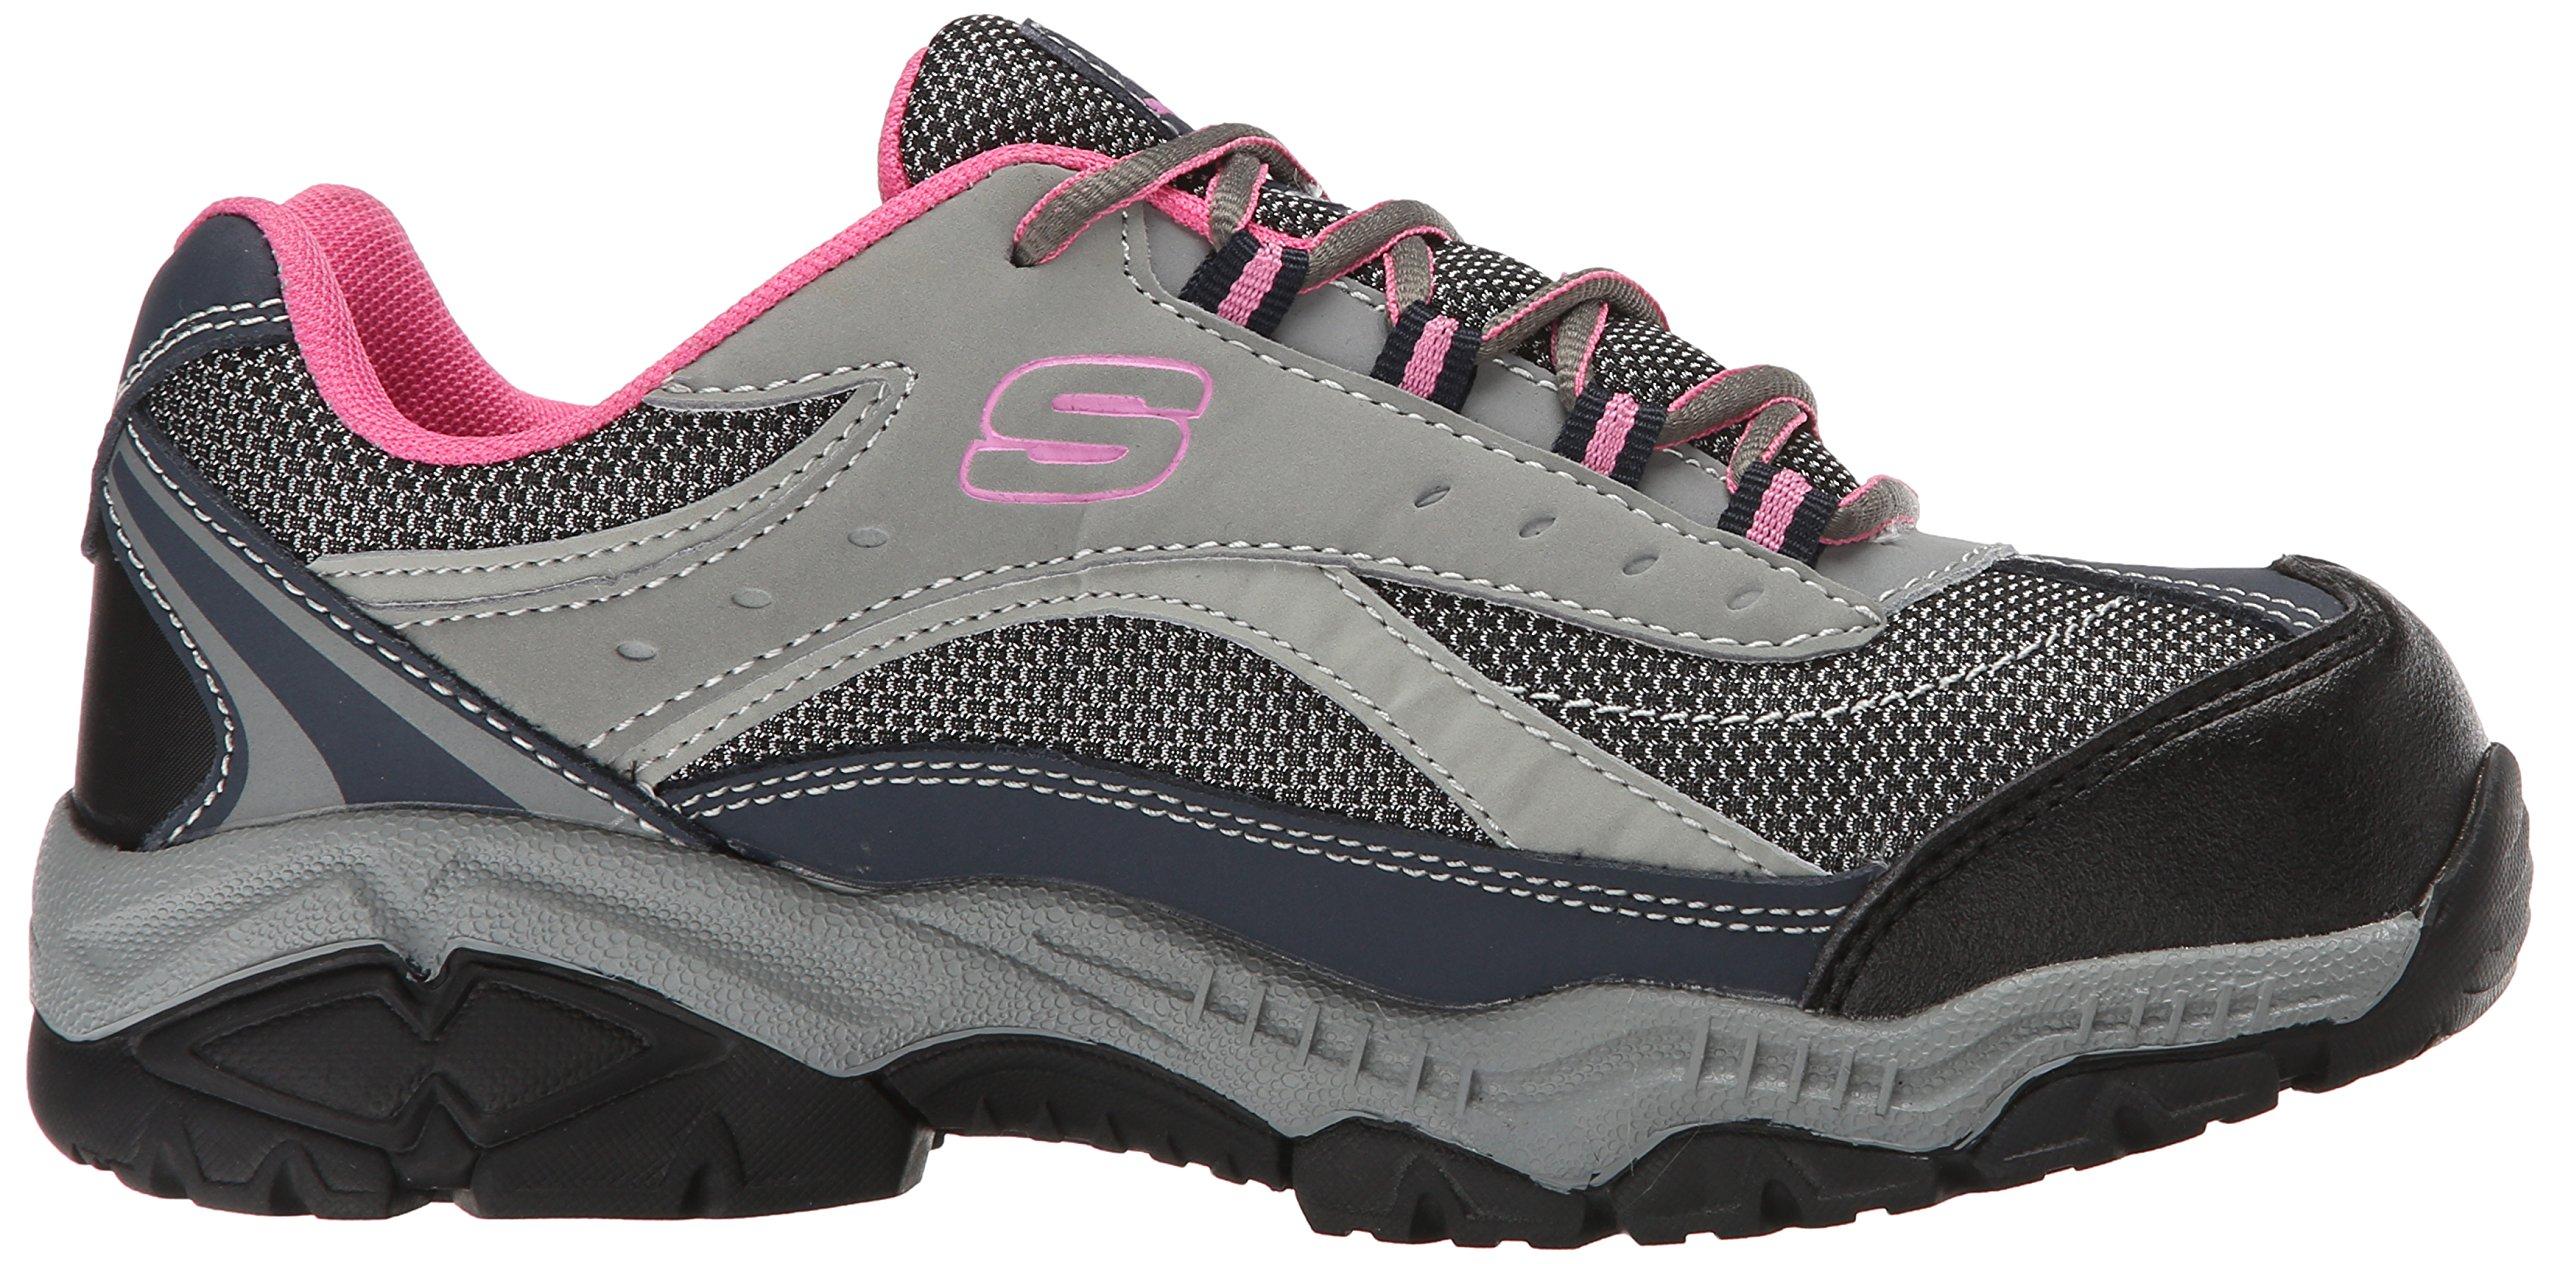 Skechers for Work Women's Doyline Hiker Boot, Gray Pink, 9 M US by Skechers (Image #7)